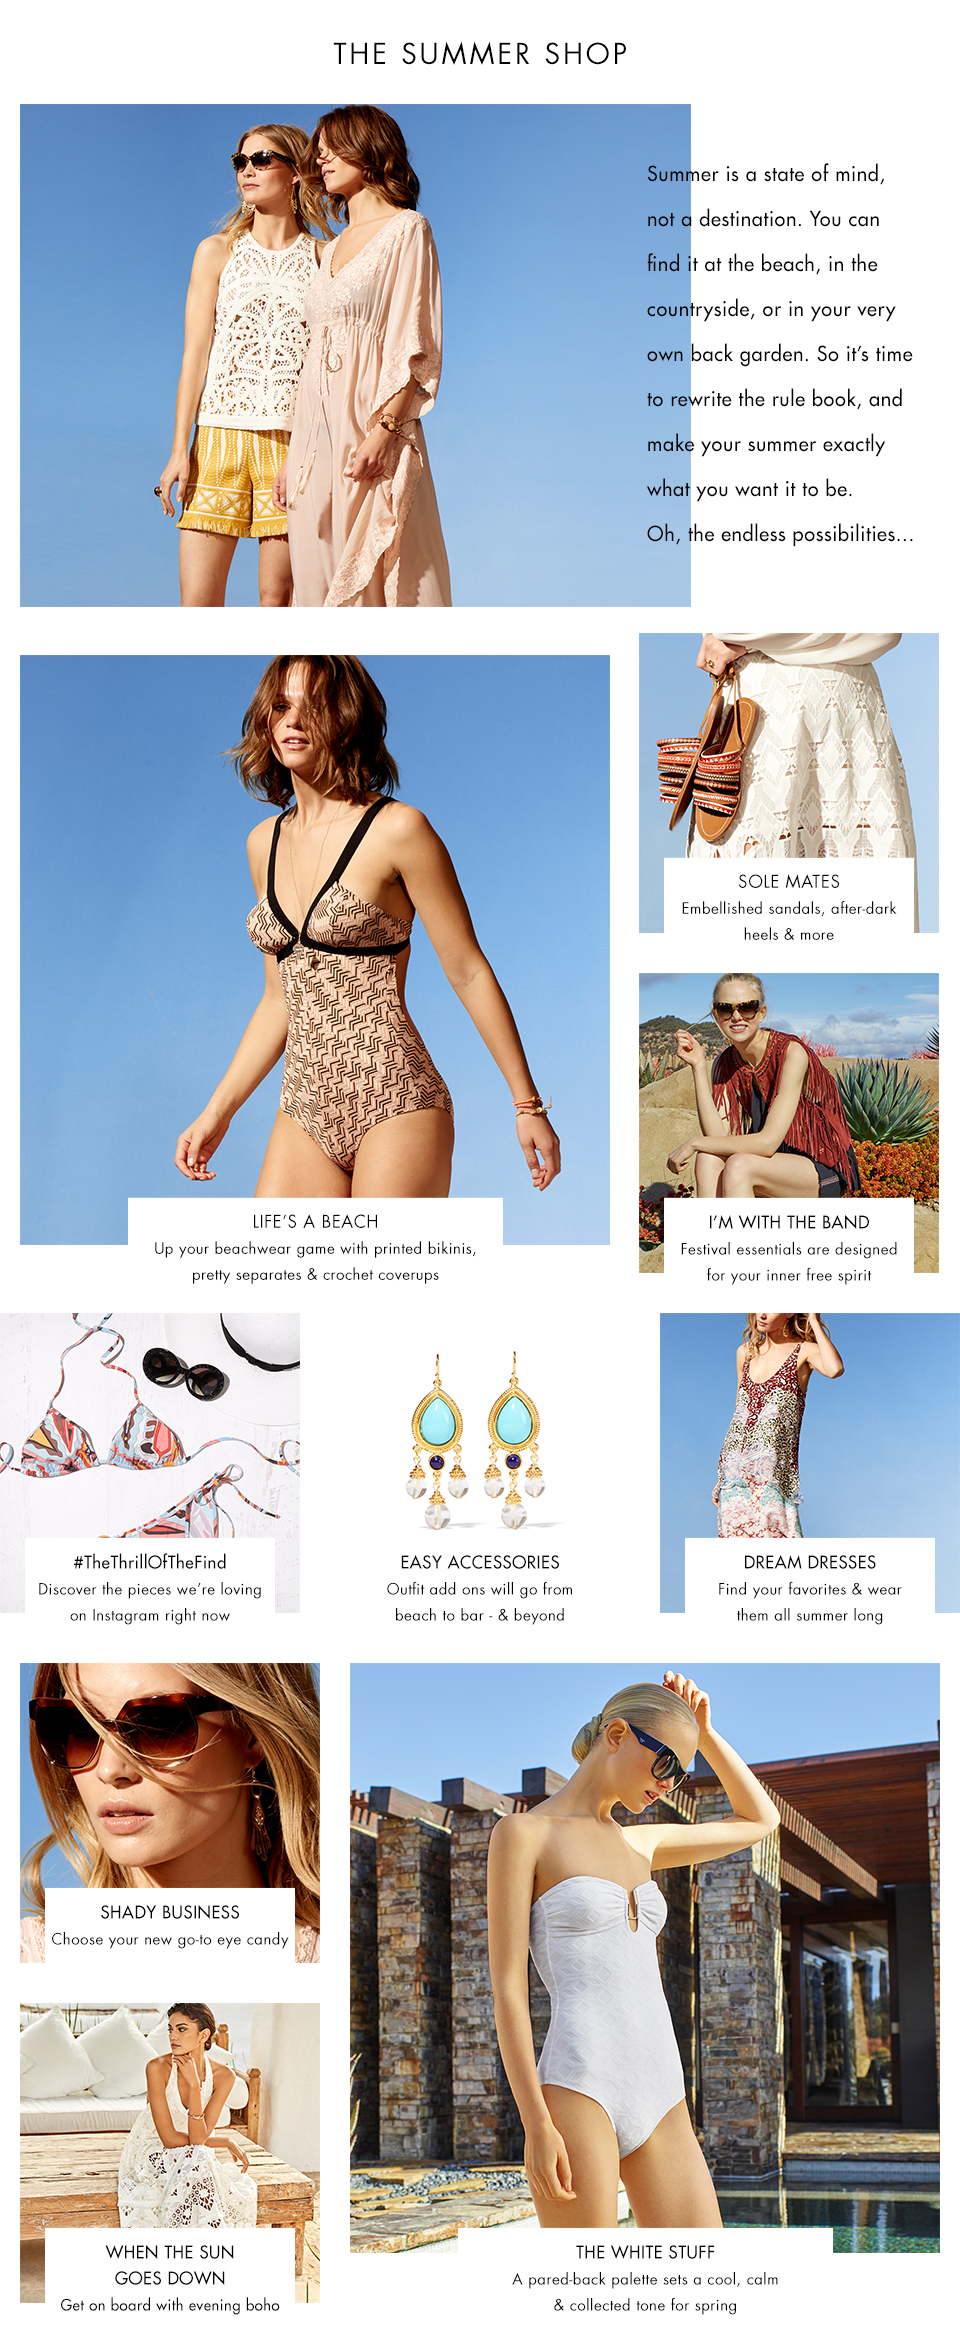 Outnet.com Summer Shop